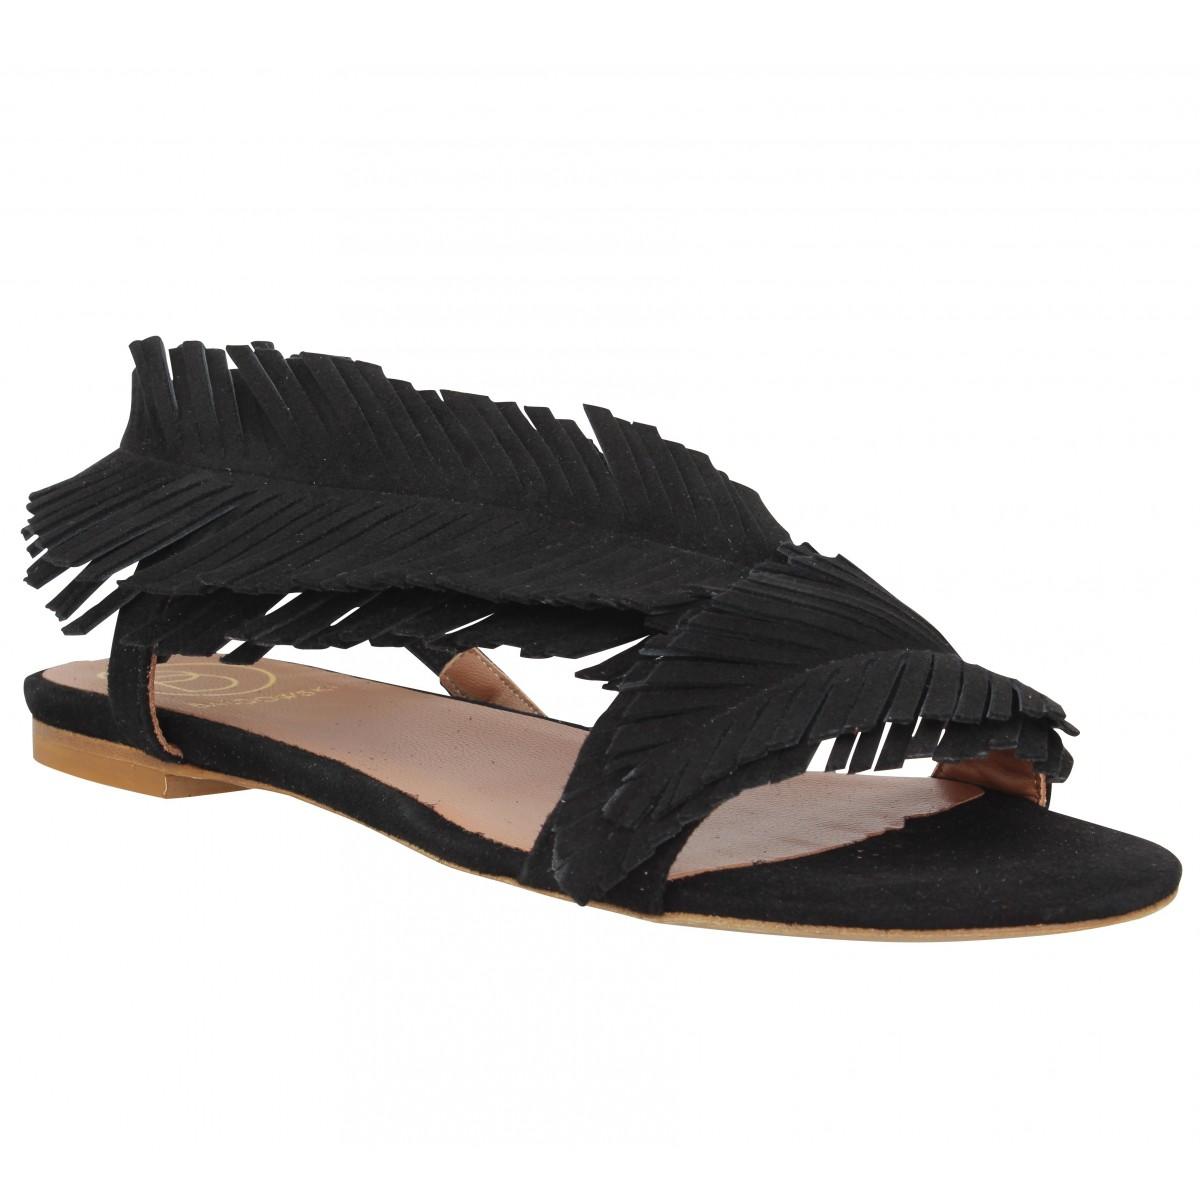 Nu-pieds BALDOWSKI 198 velours Femme Noir